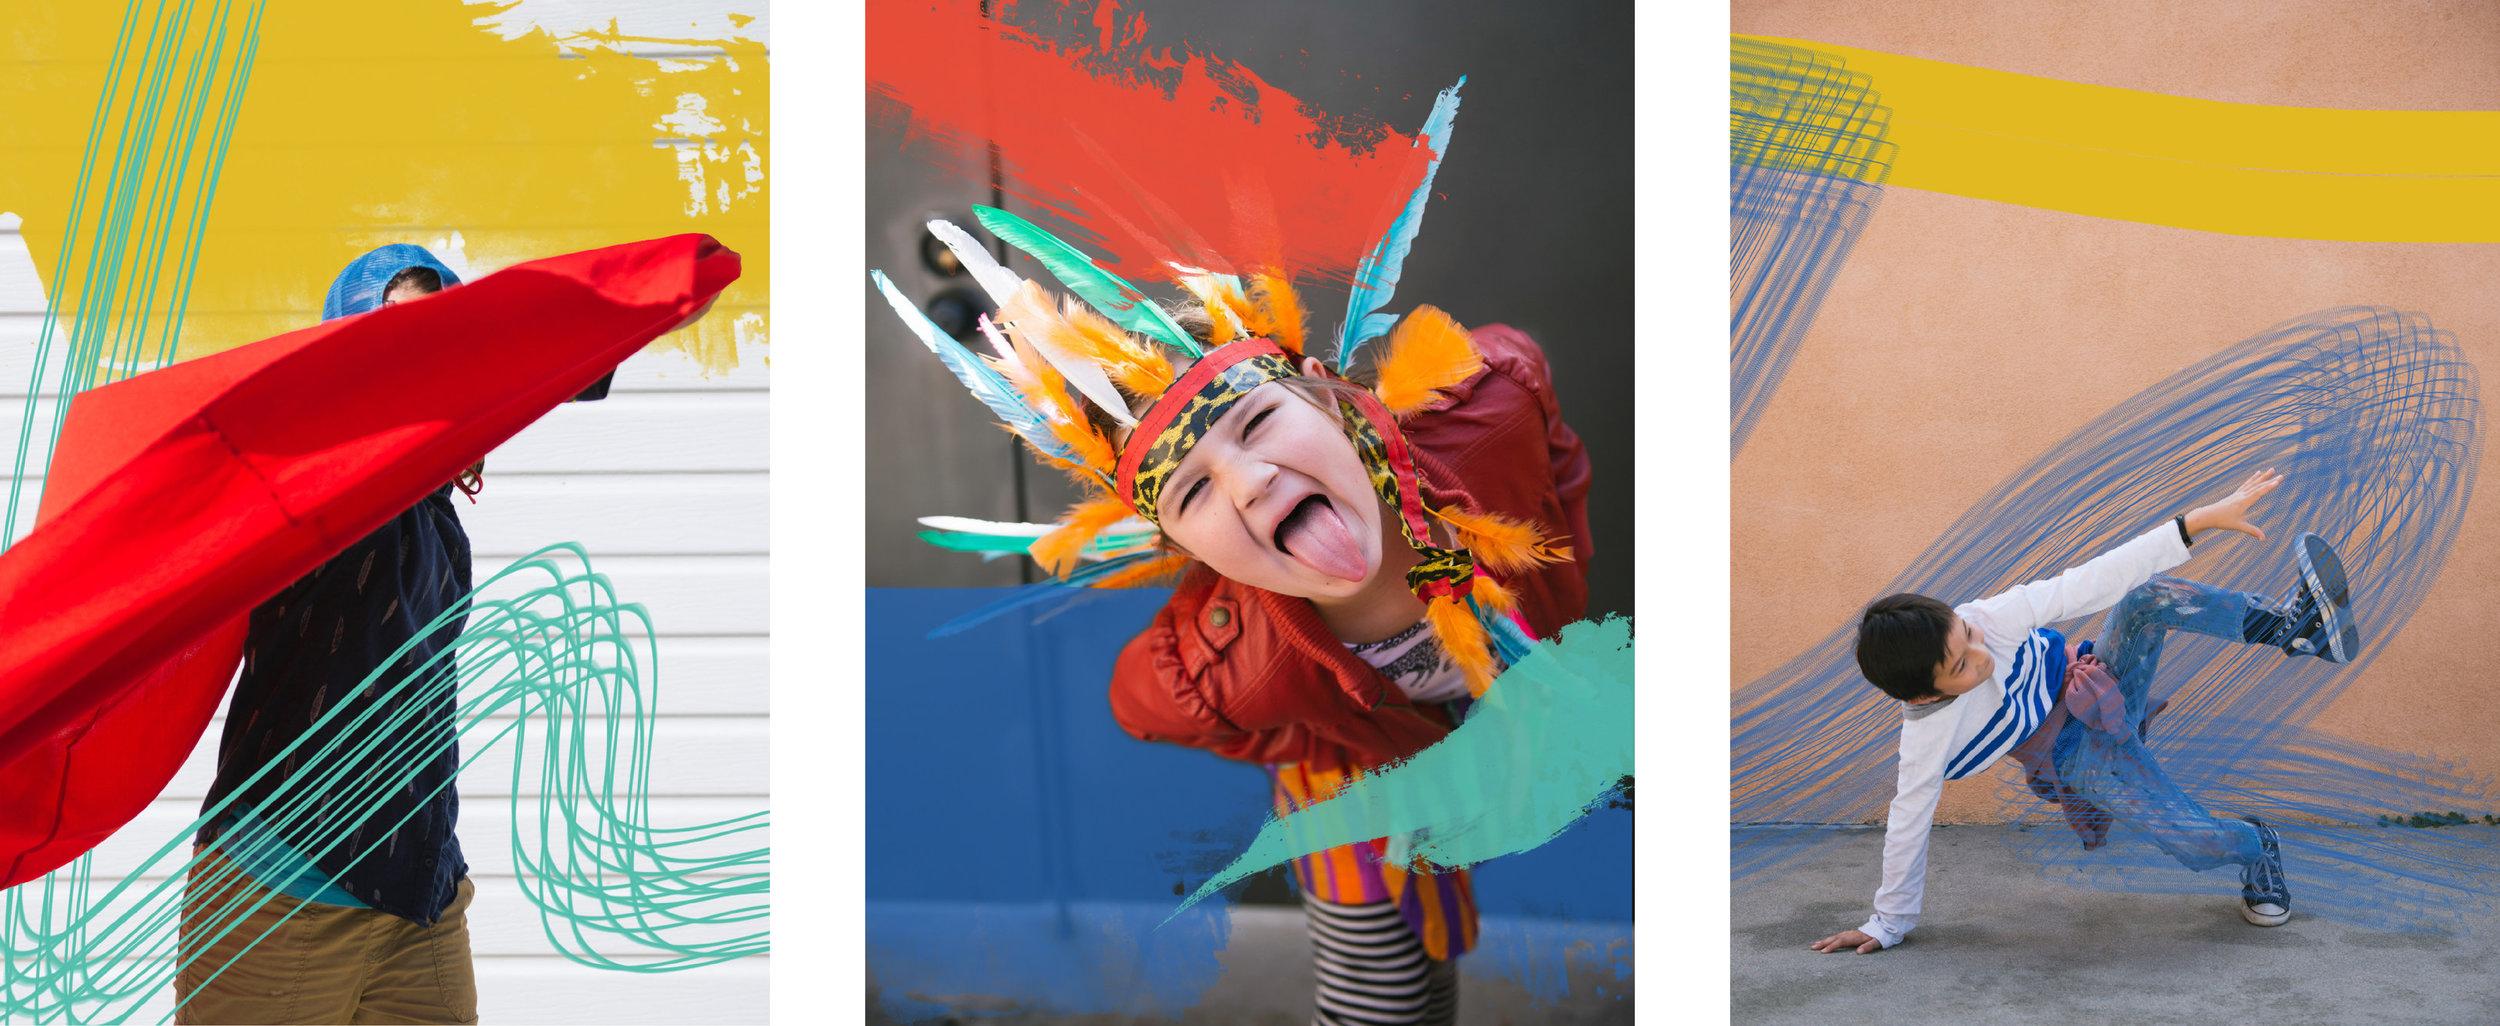 CANOPY_Ink Theater_Branding_Image Styling.jpg